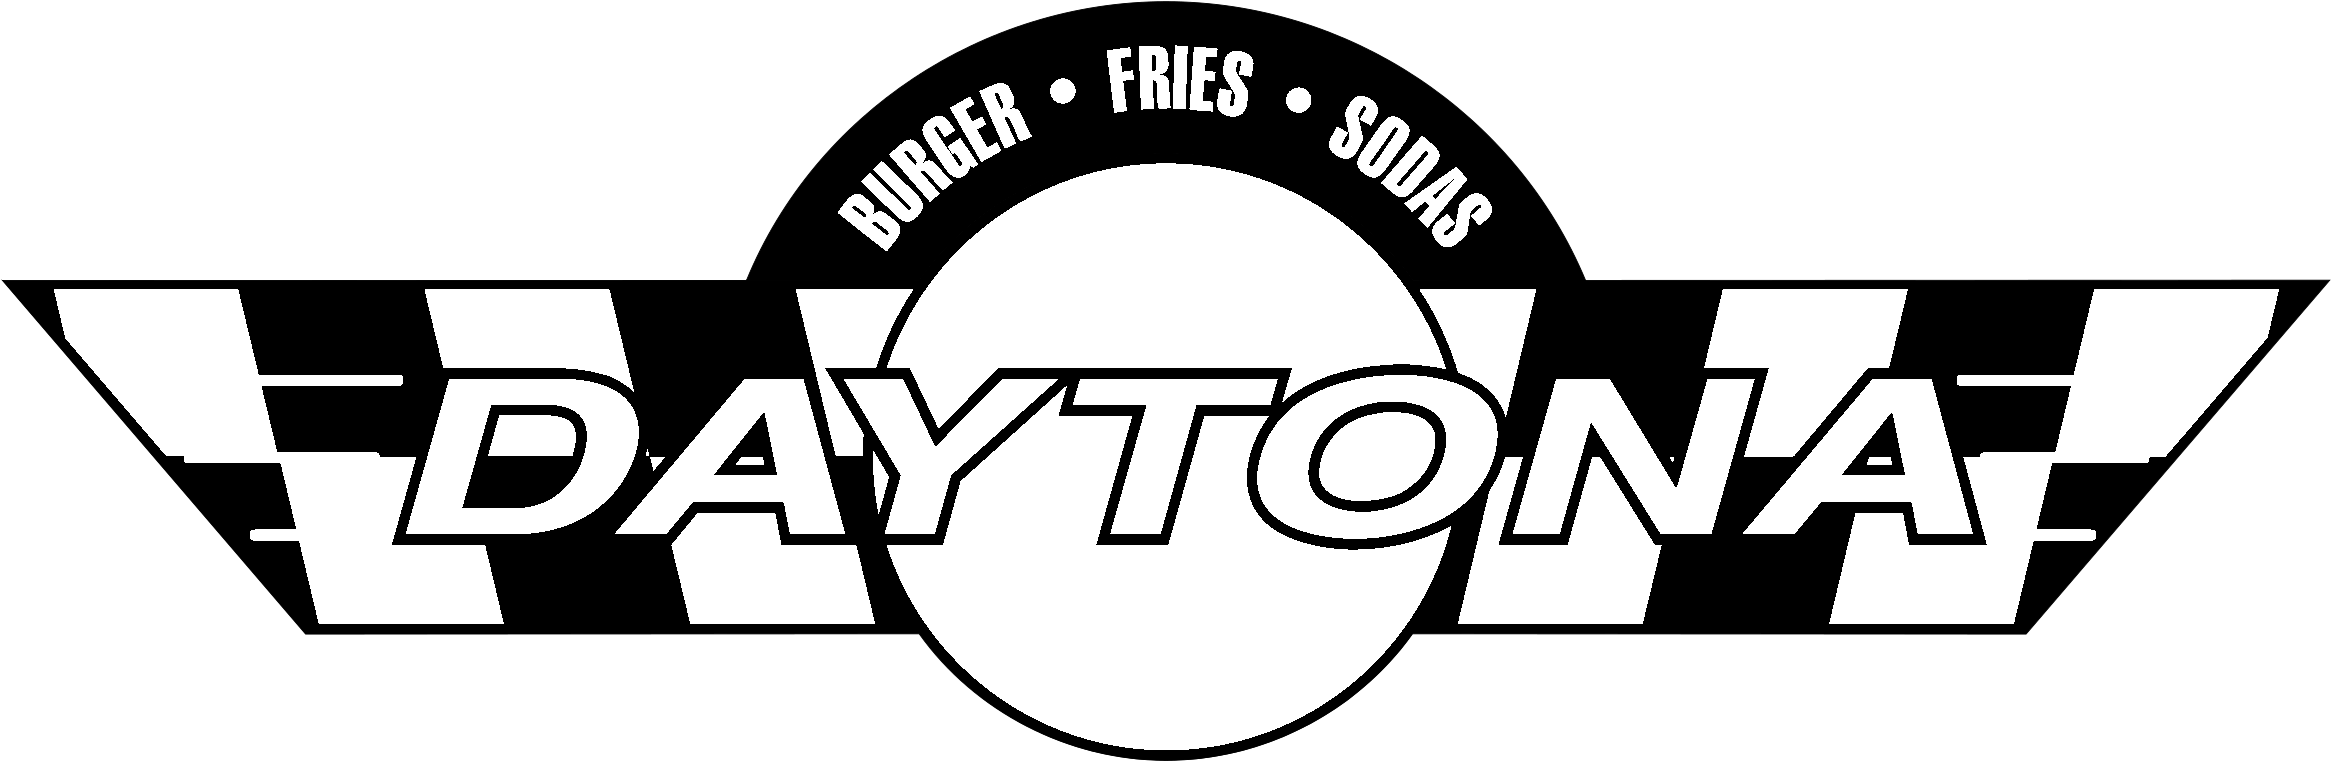 HD Daytona Logo Black And White.